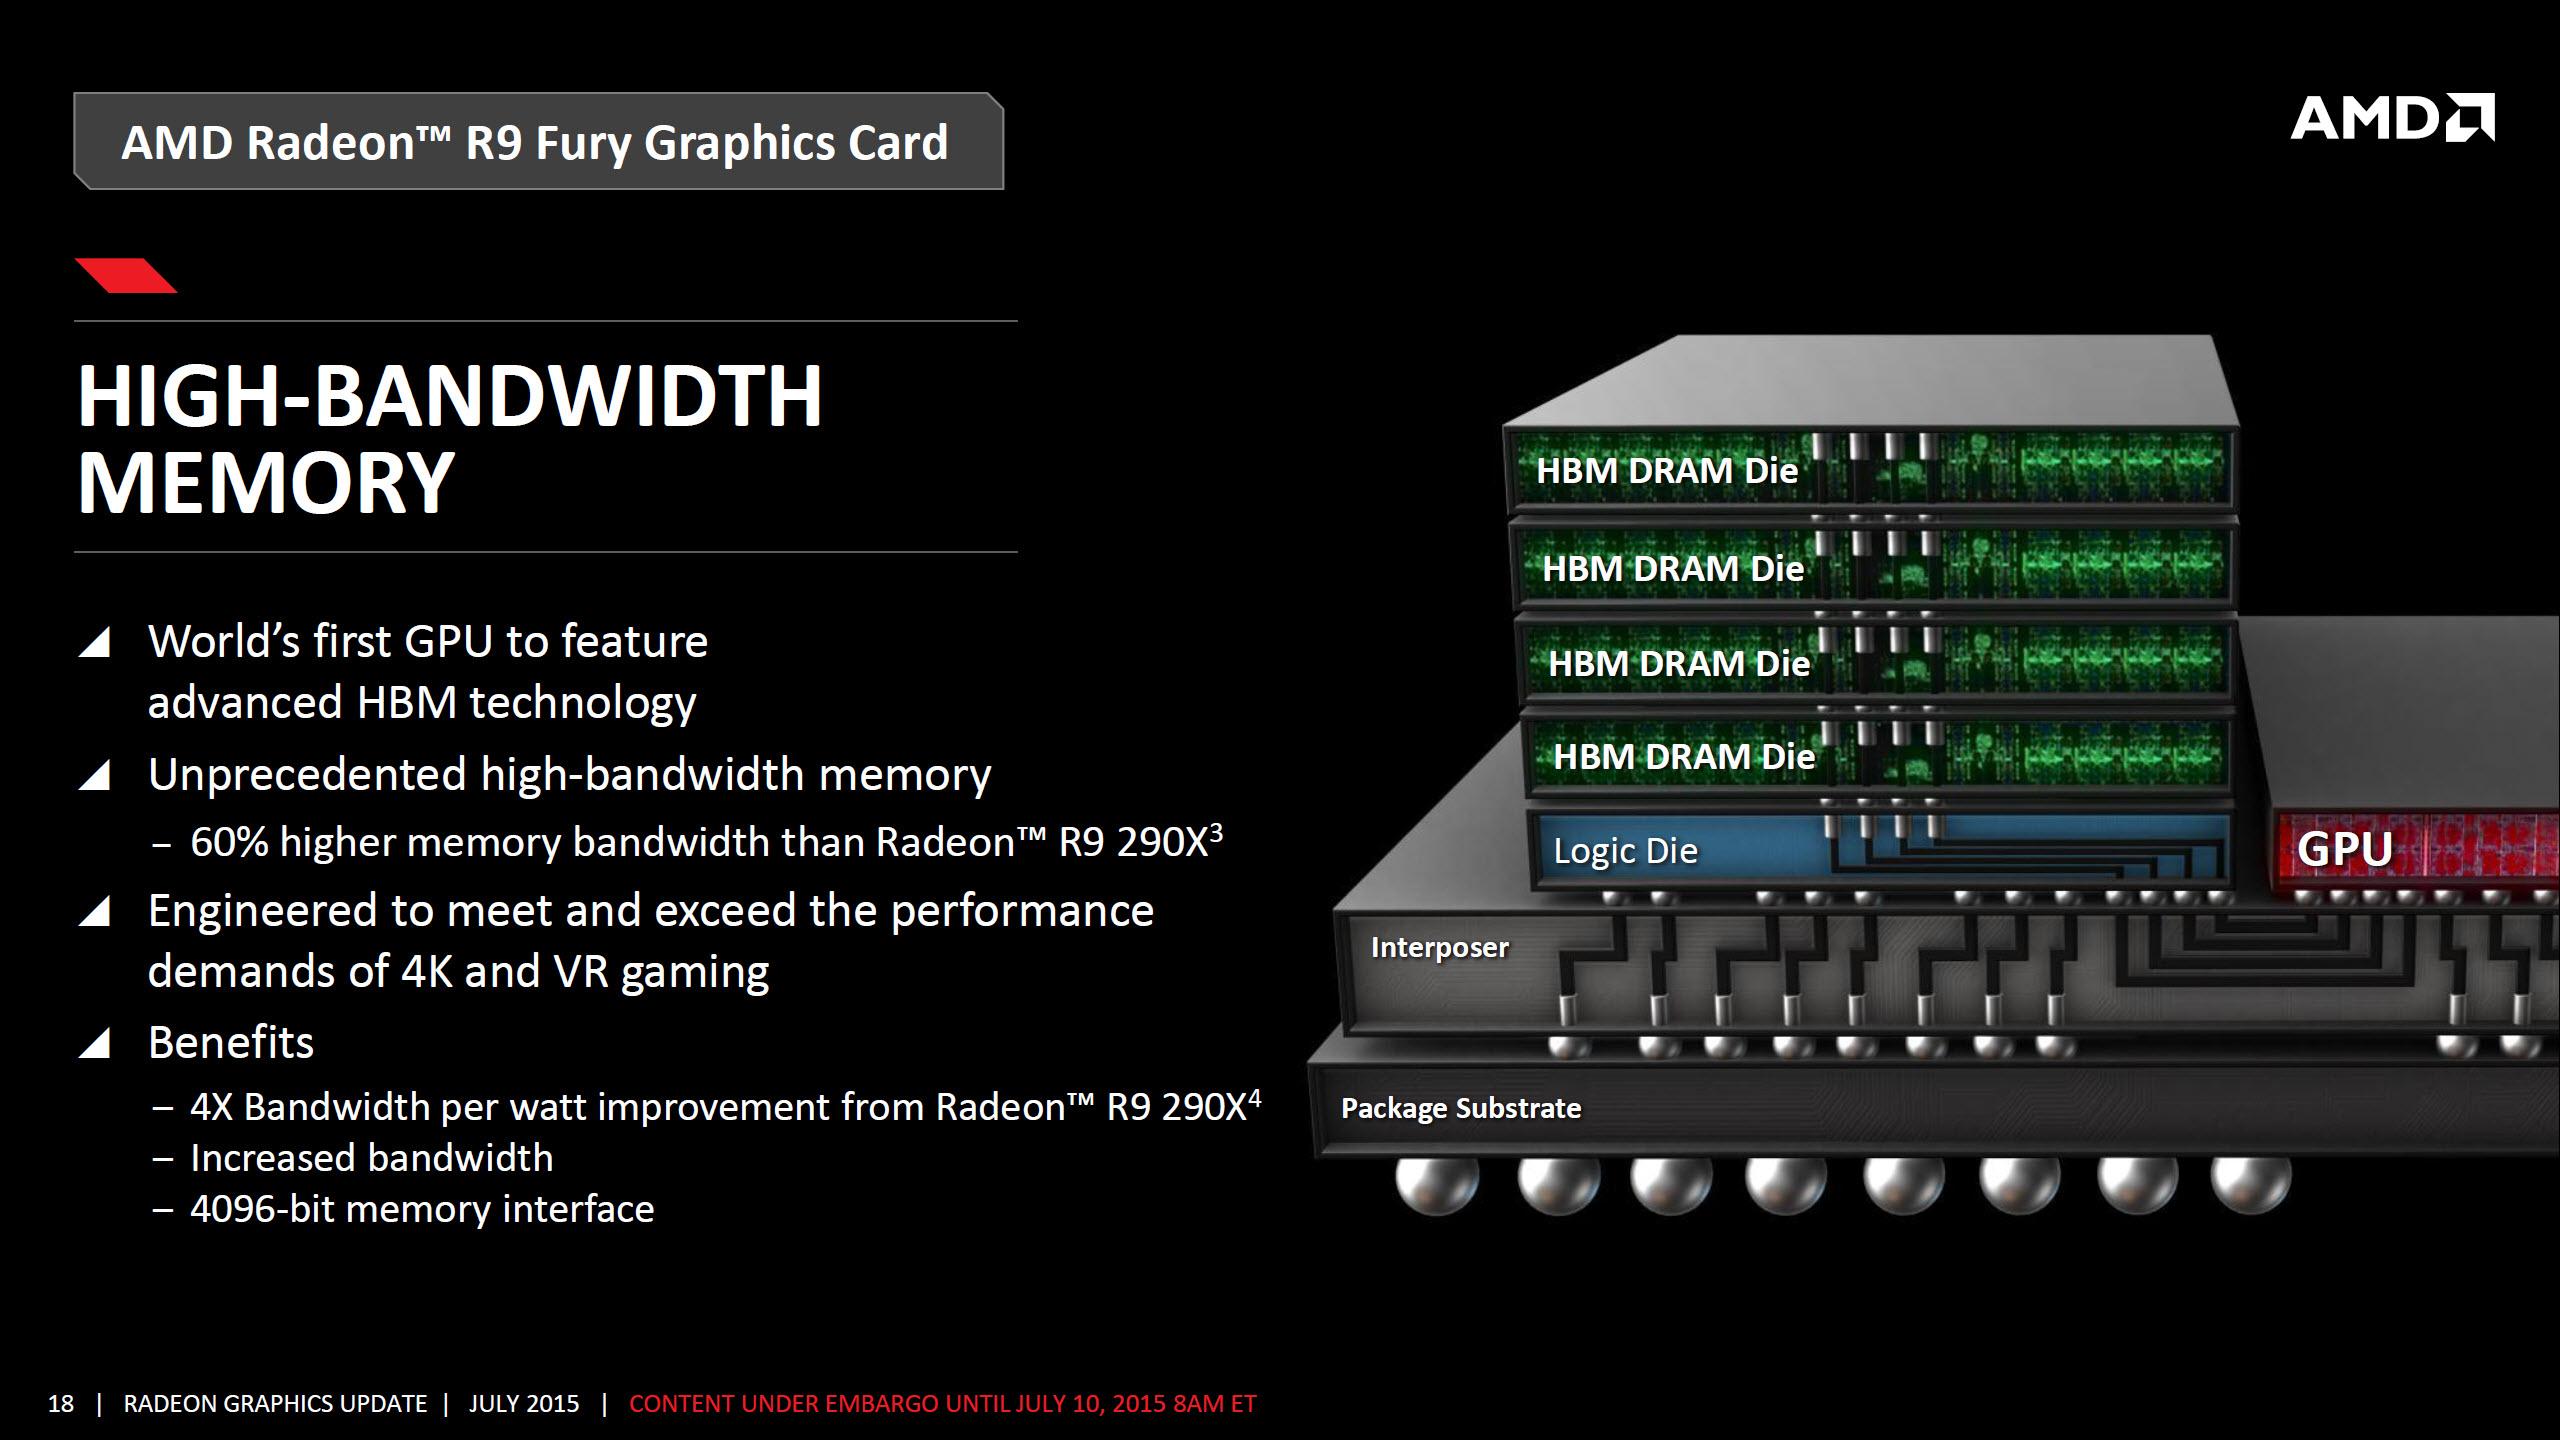 AMD Radeon R9 Fury_Fiji Pro_HBM